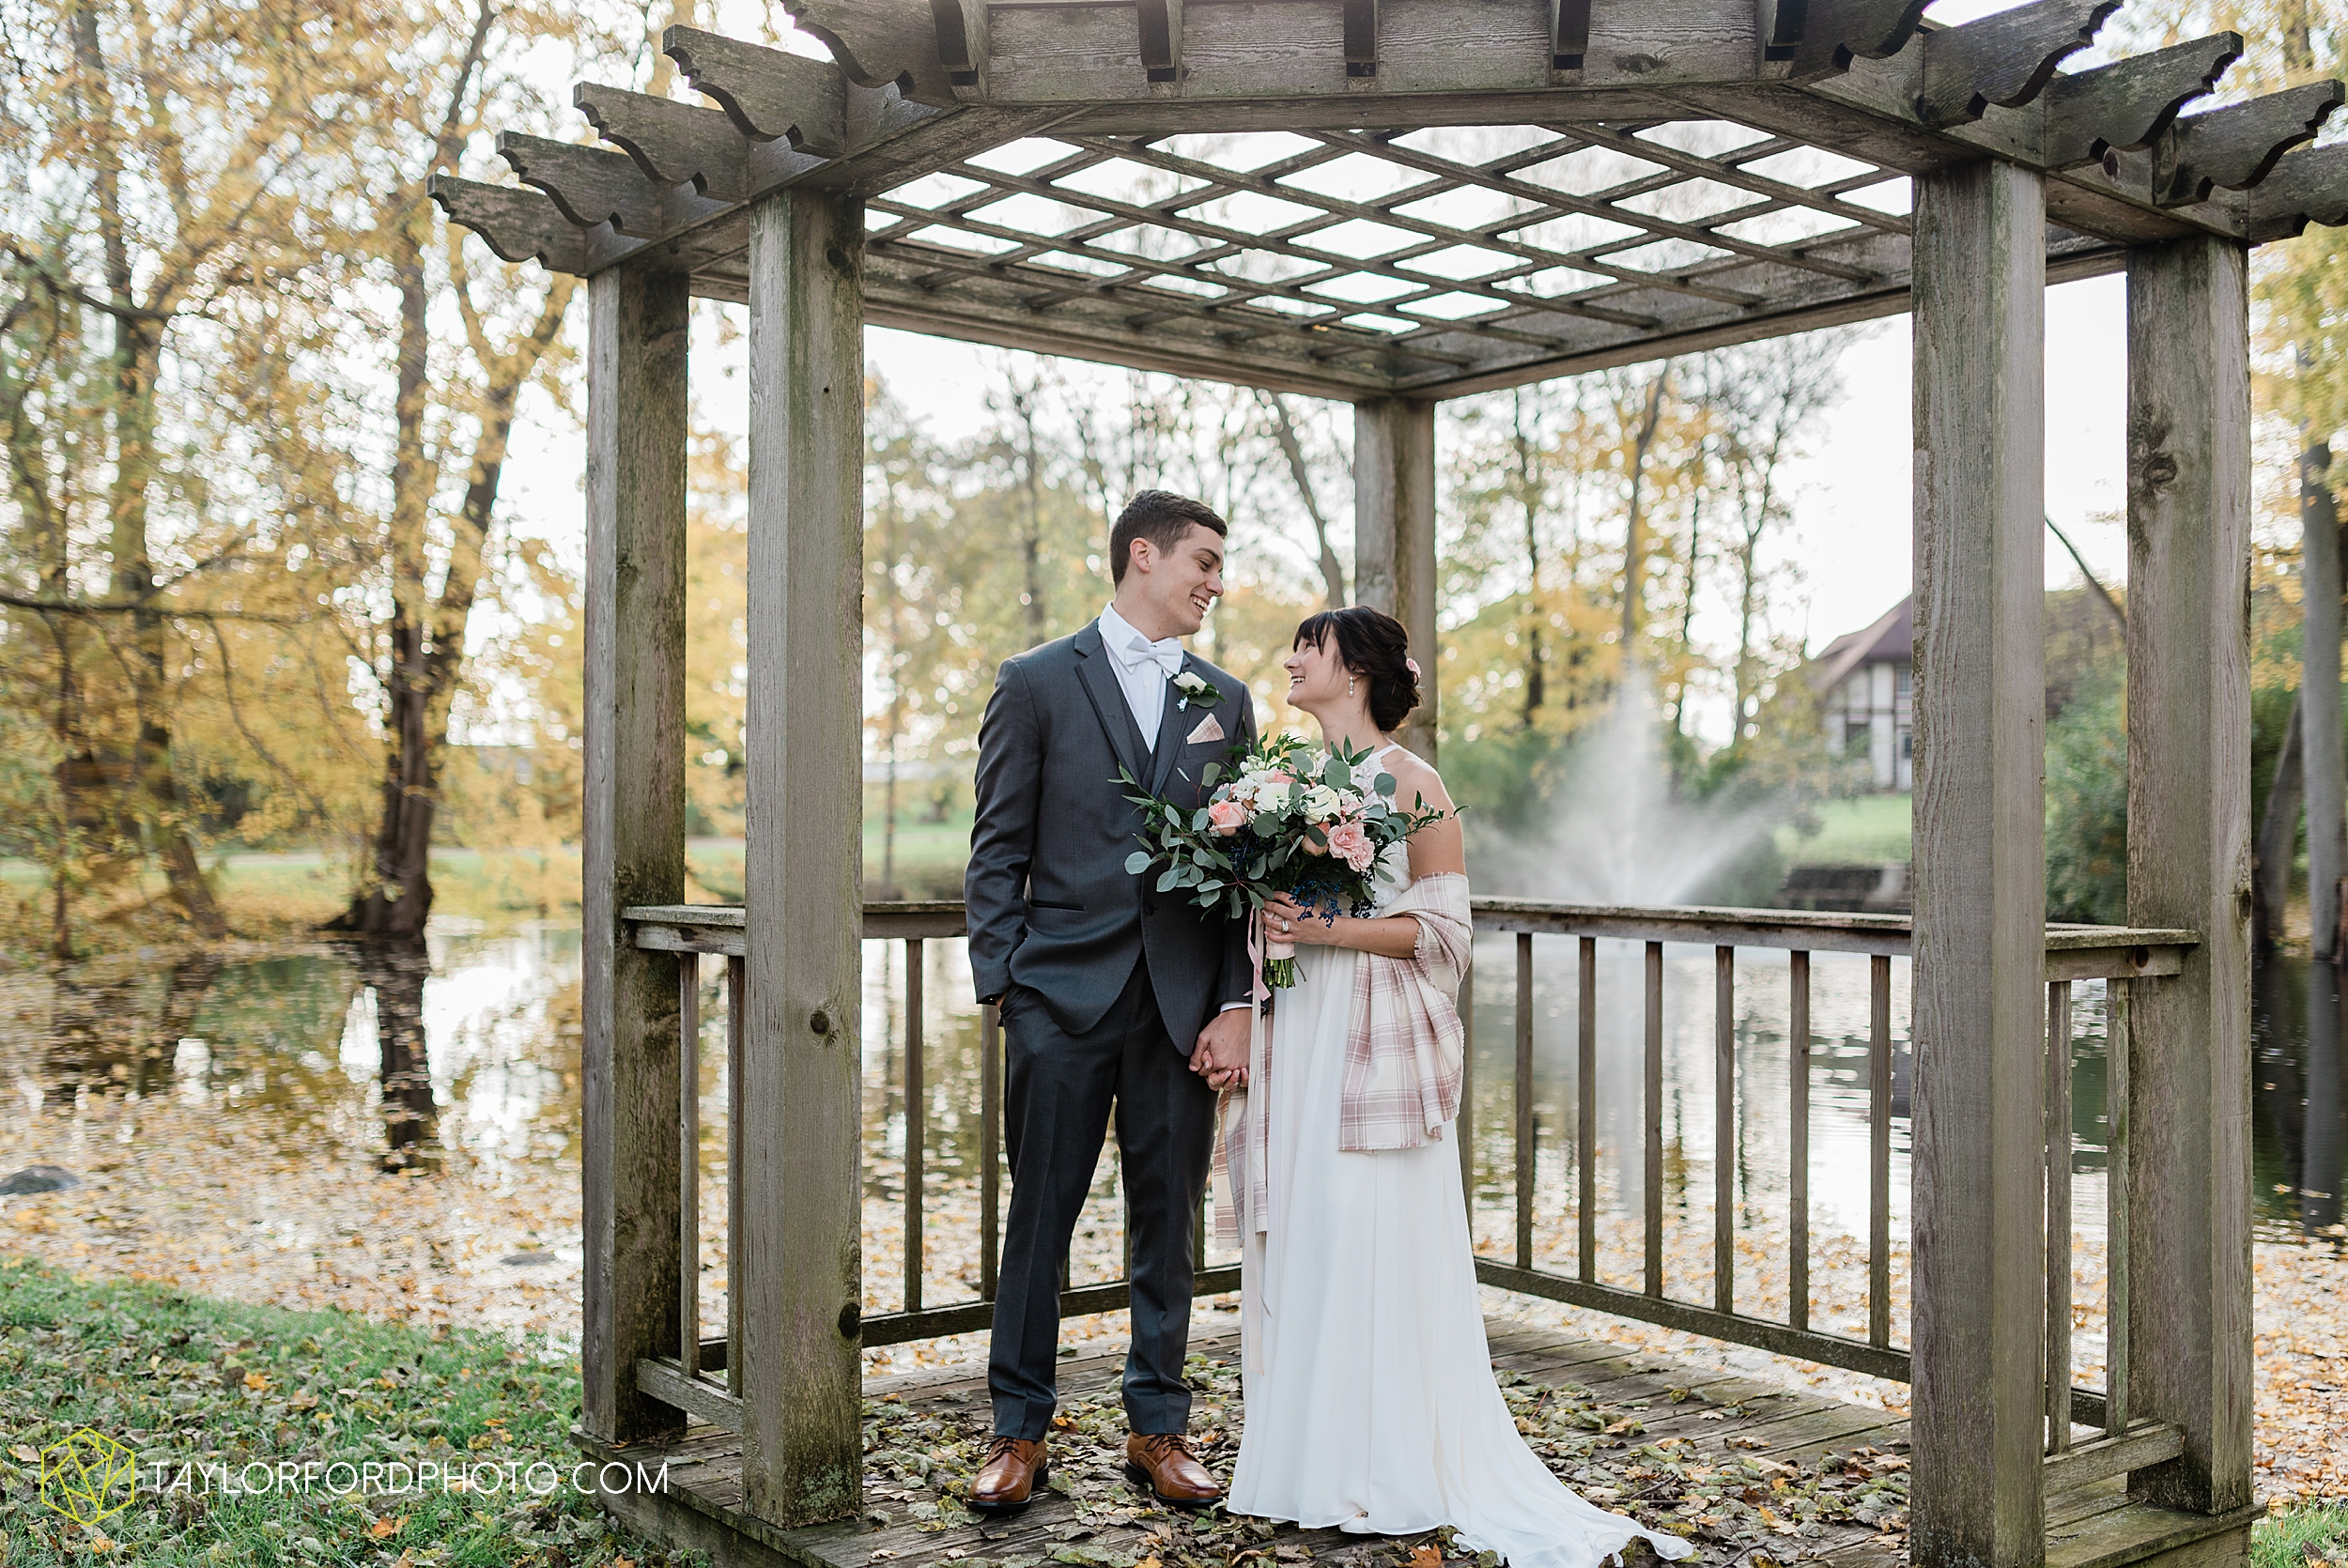 marissa-nicole-nick-daeger-orrmont-estate-farm-wedding-piqua-dayton-troy-ohio-fall-photographer-taylor-ford-photography_1512.jpg